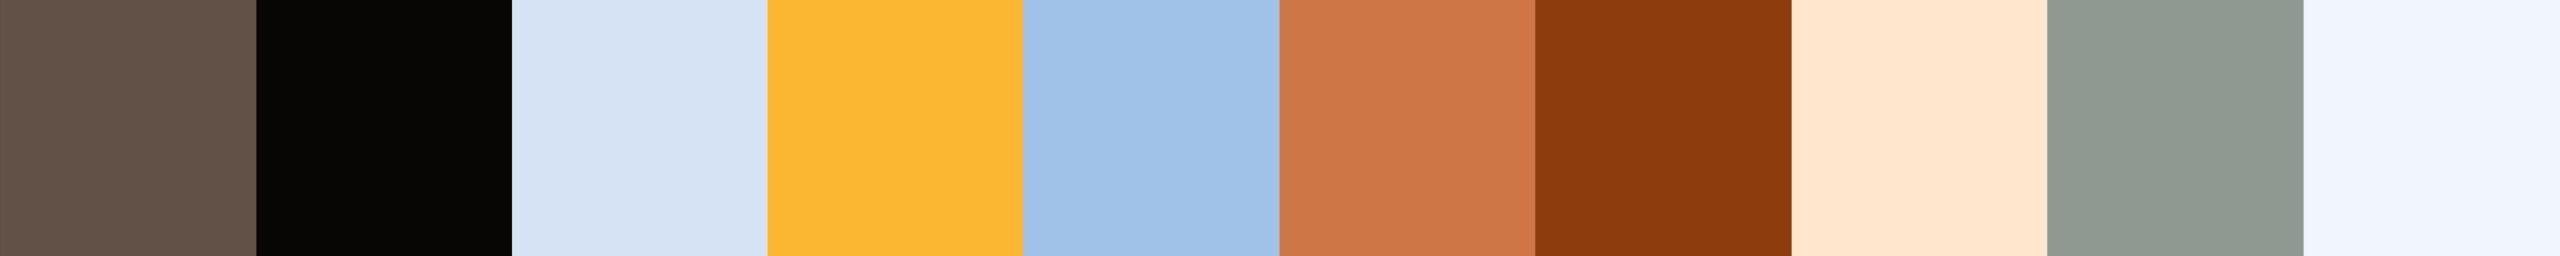 656 Farabola Color Palette